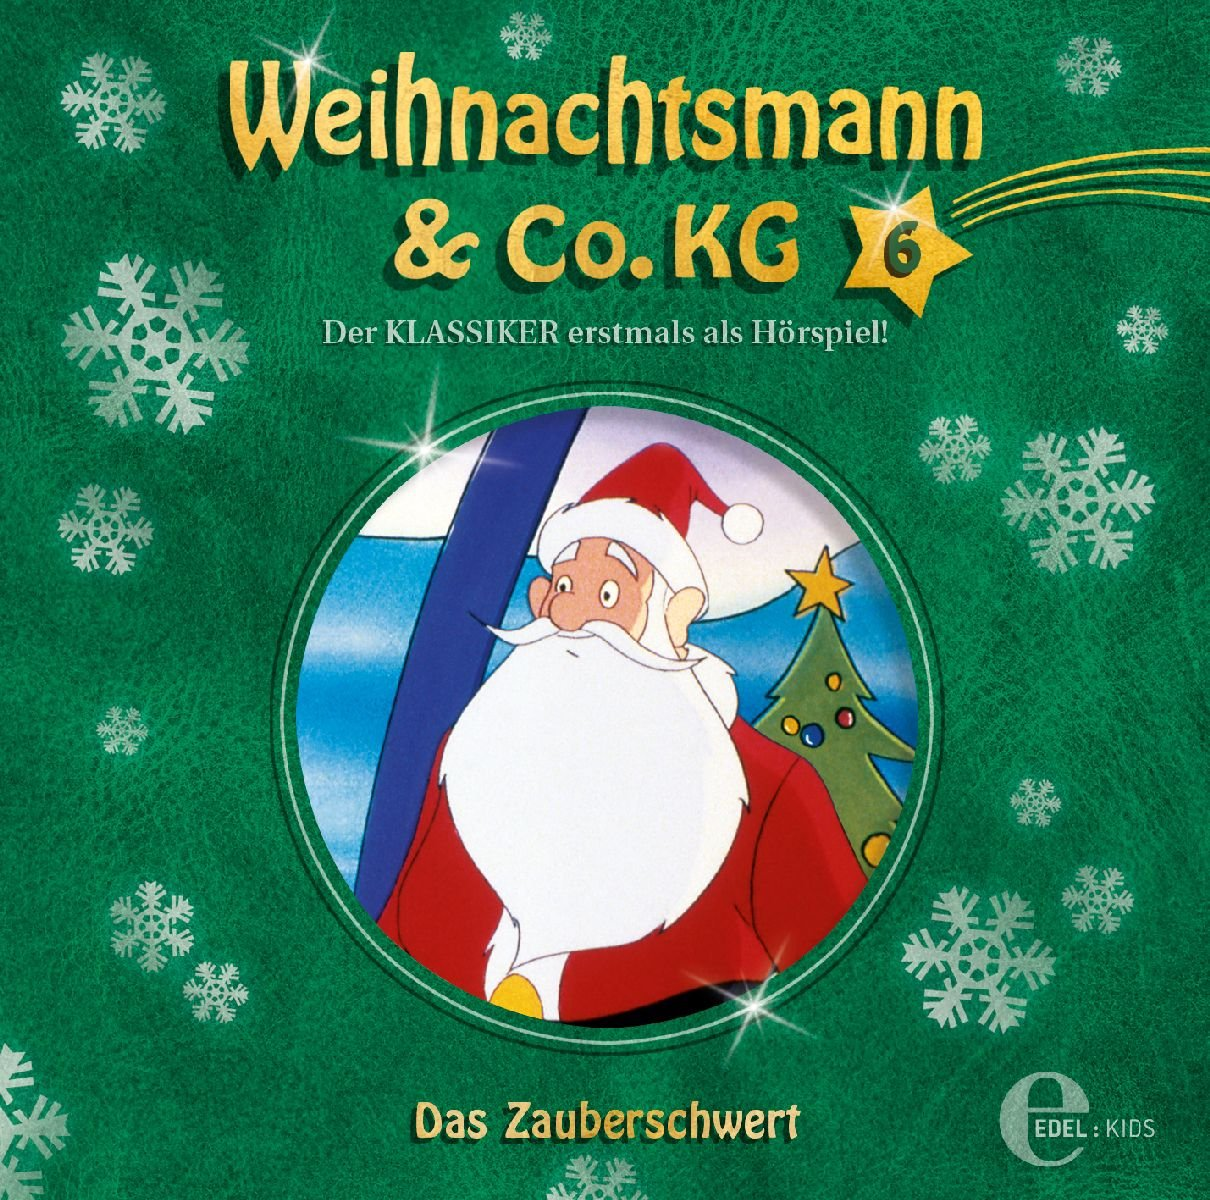 weihnachtsmann co kg 1 6 h rbuch downloads nox. Black Bedroom Furniture Sets. Home Design Ideas